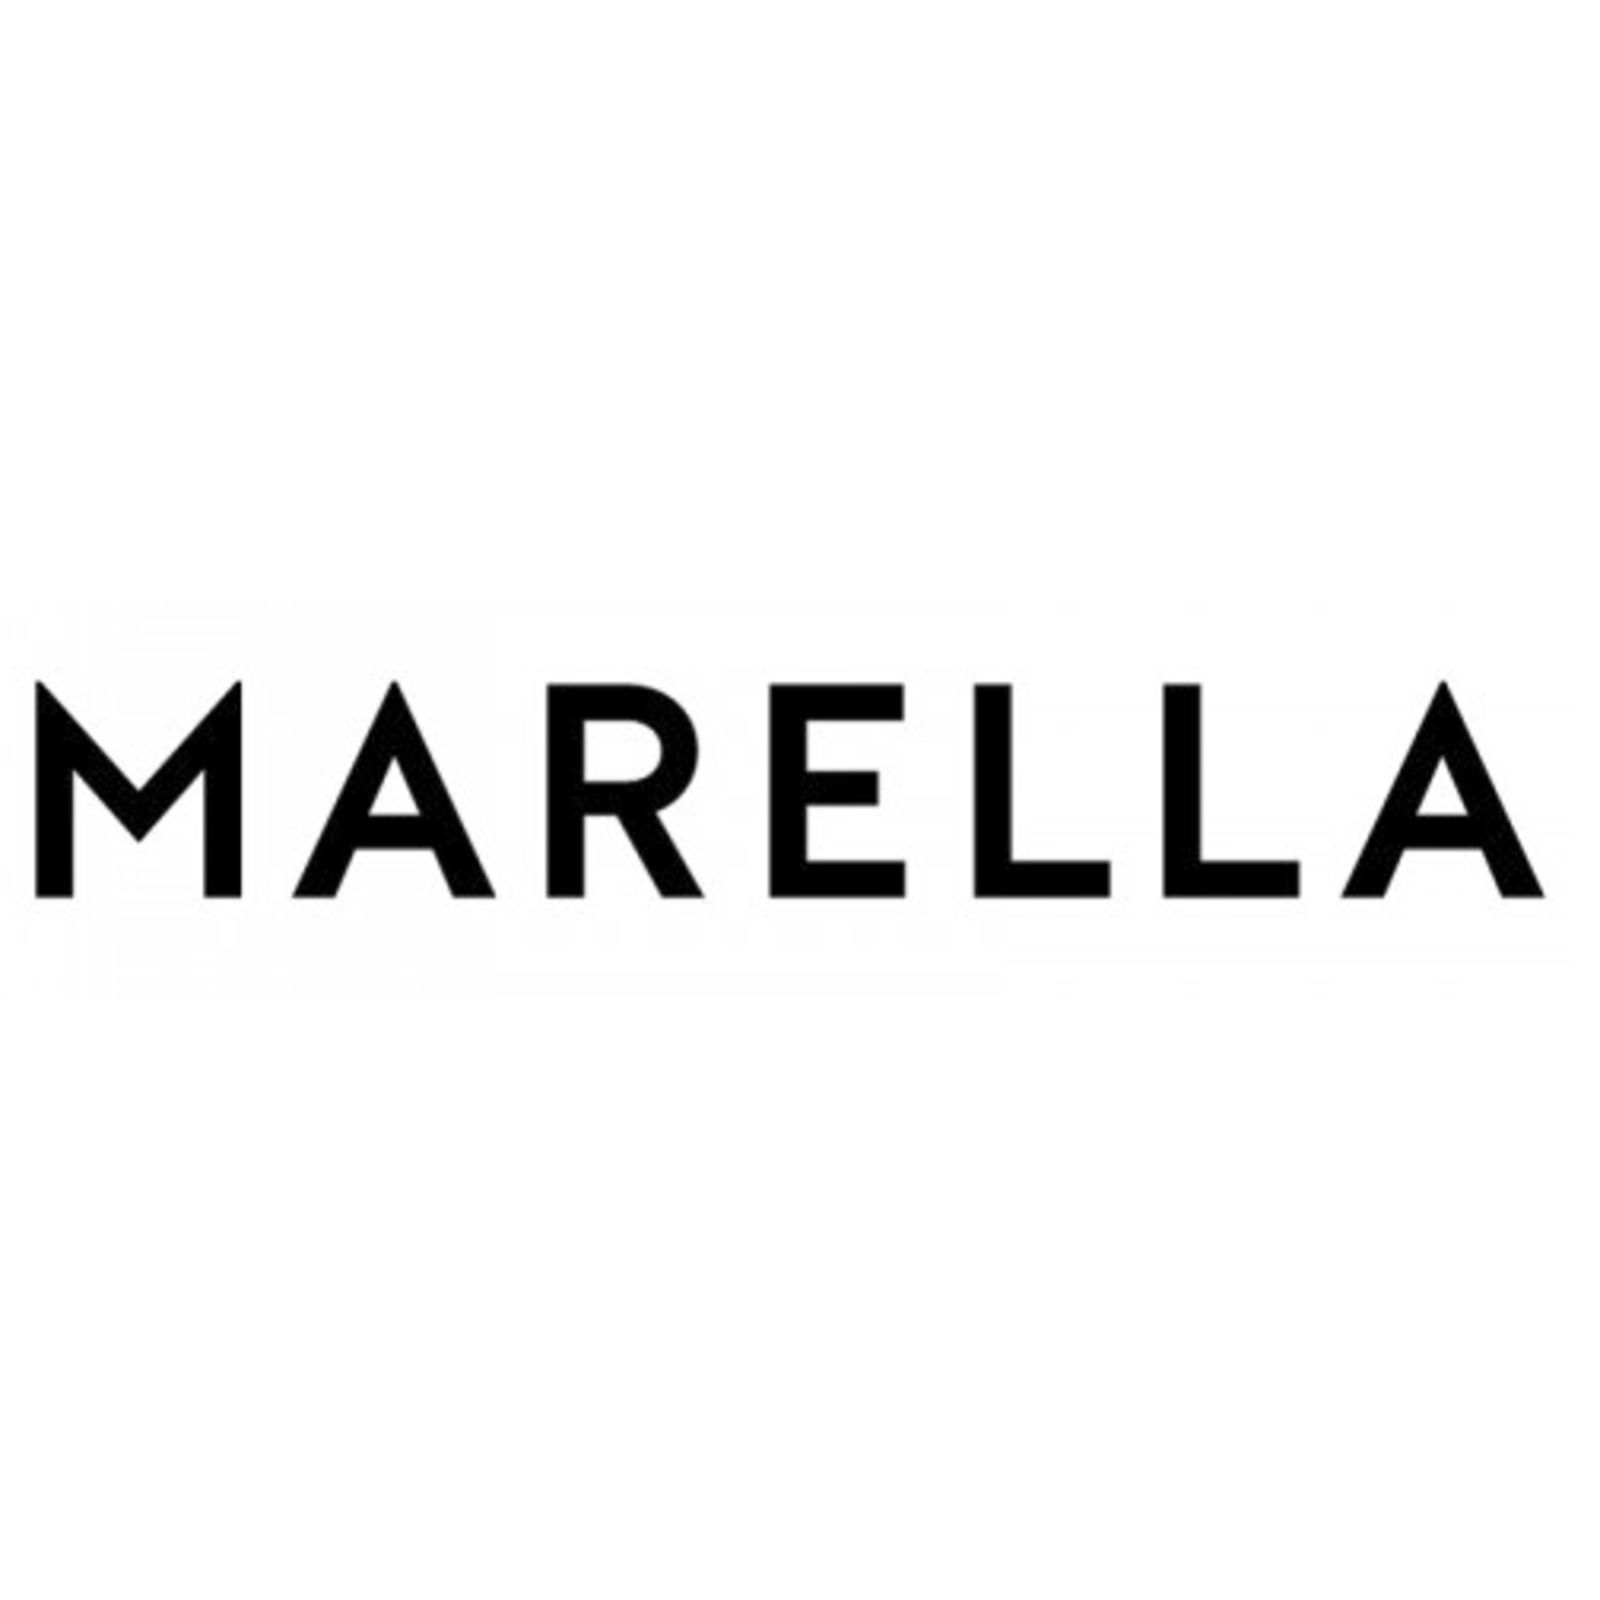 MARELLA (Изображение 1)